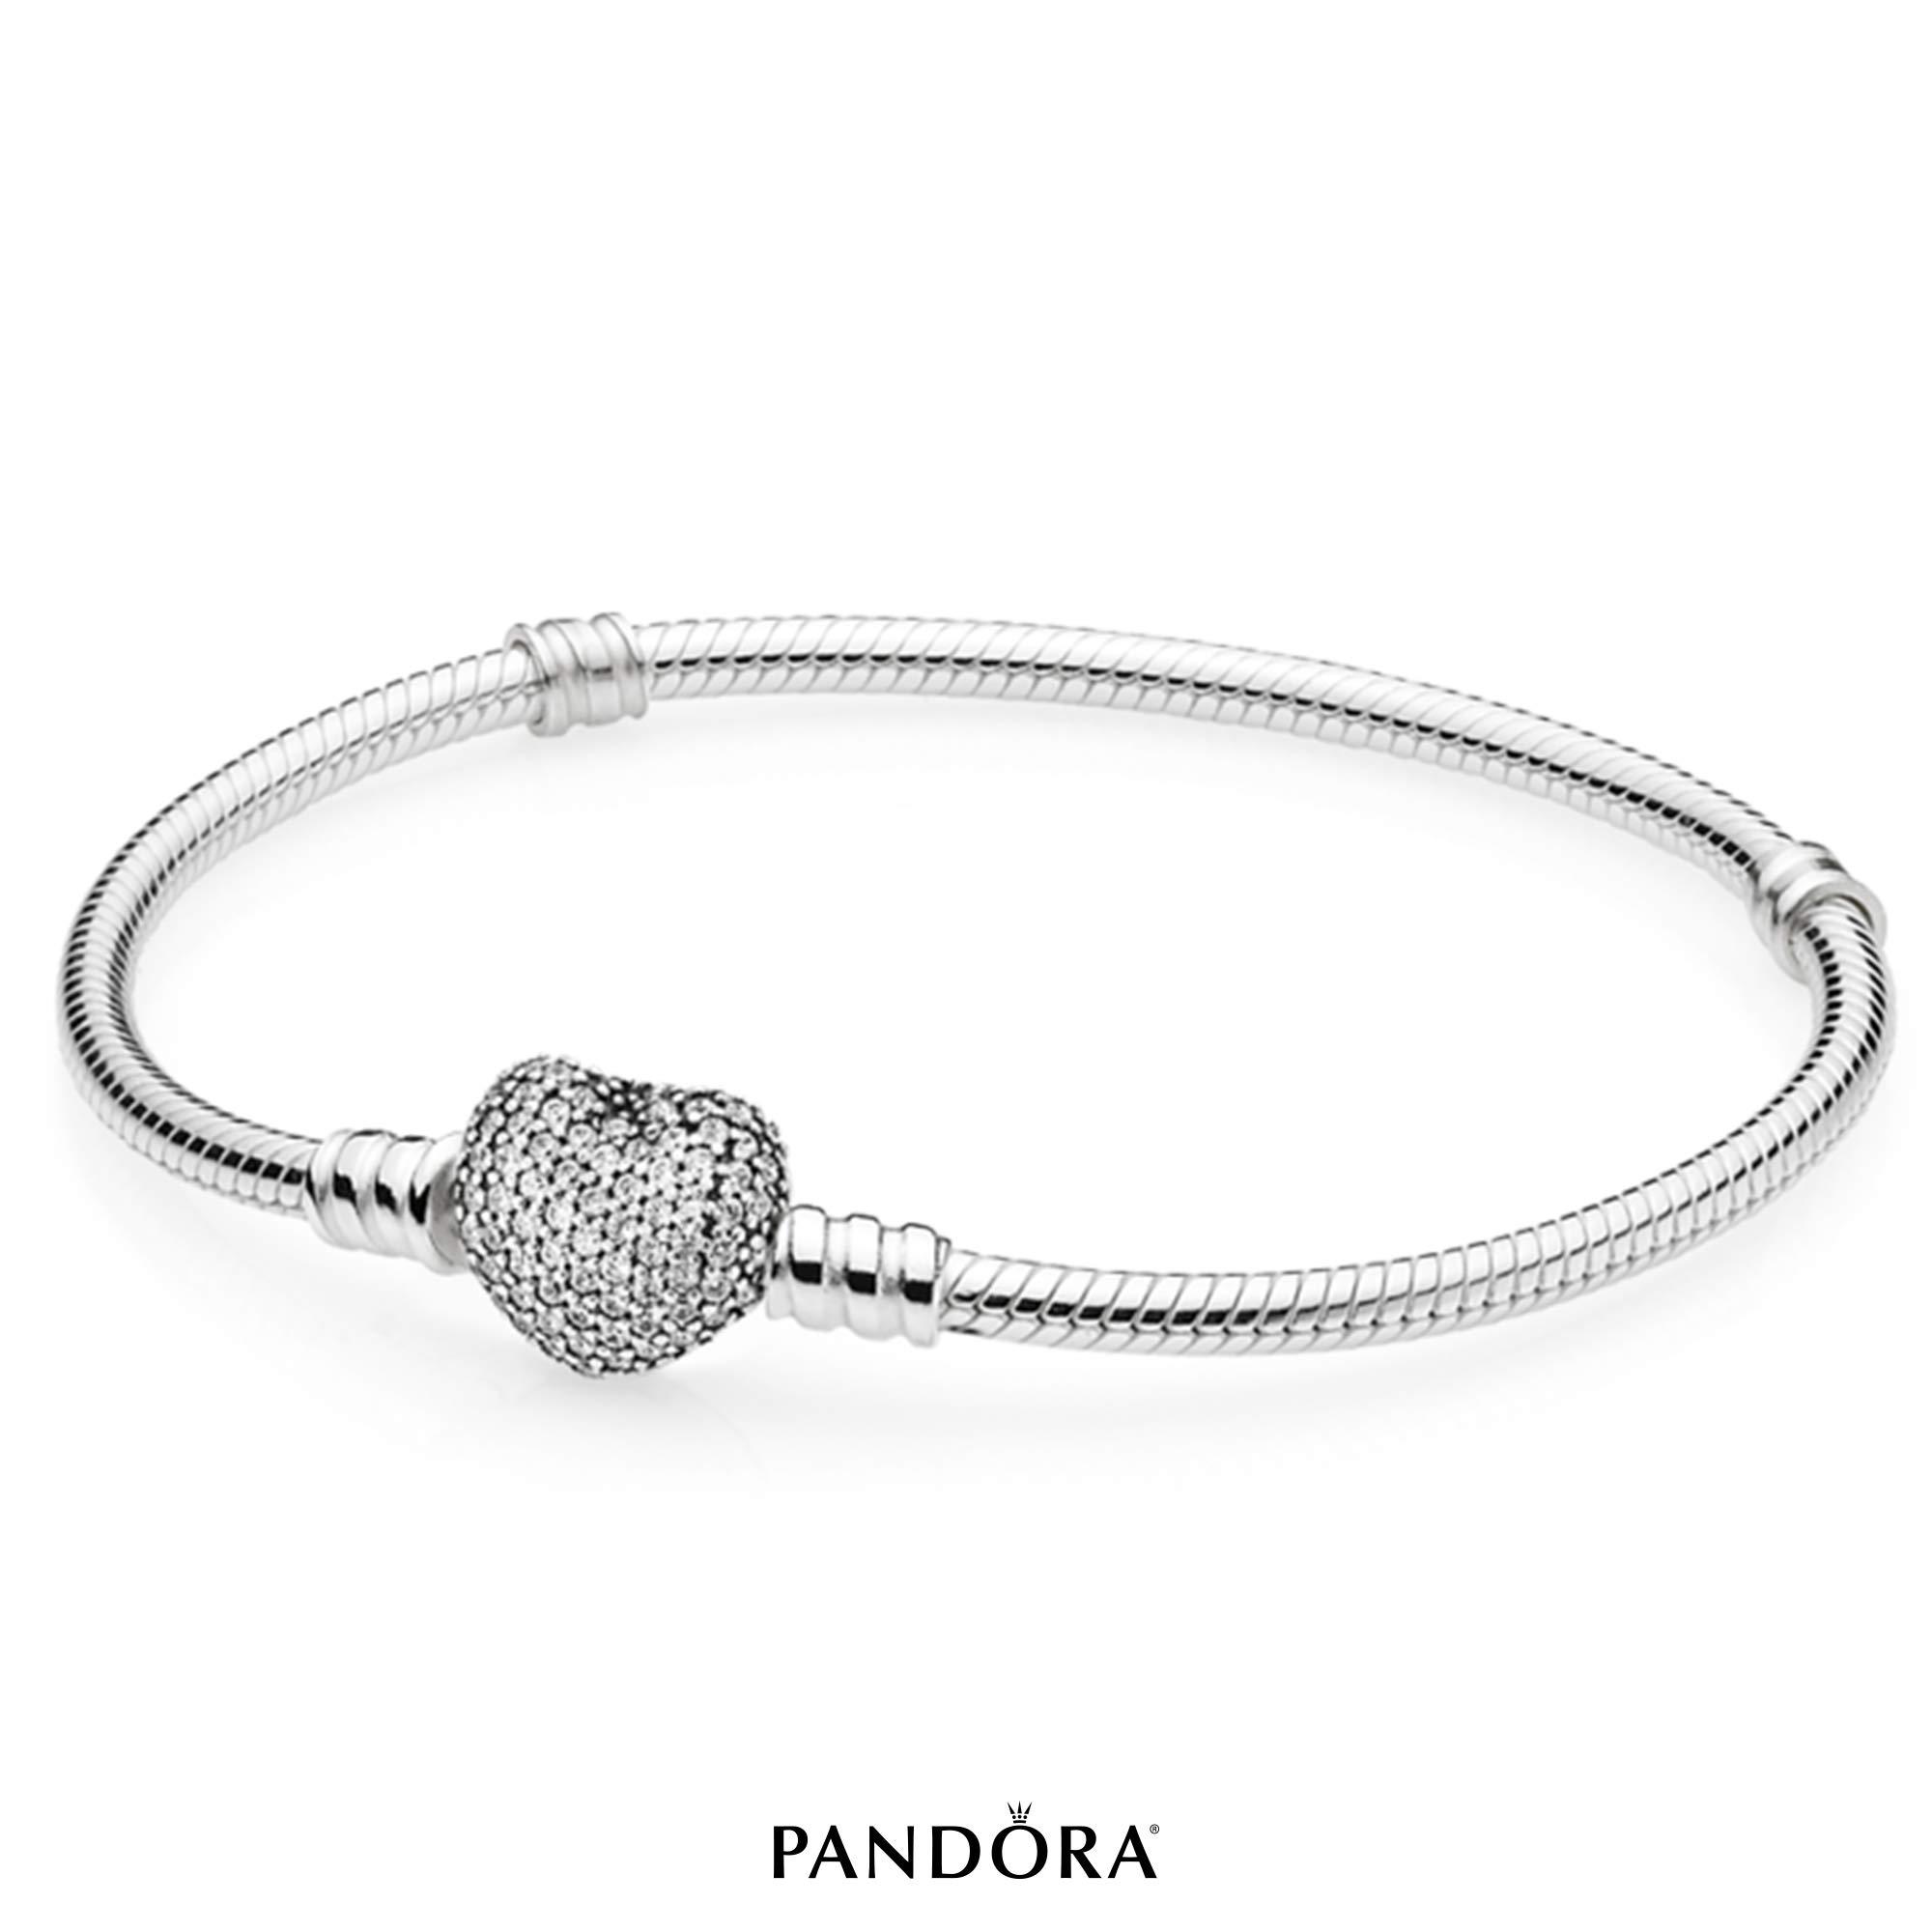 PANDORA Pavé Heart Bracelet, Sterling Silver, Clear Cubic Zirconia, 7.5 in by PANDORA